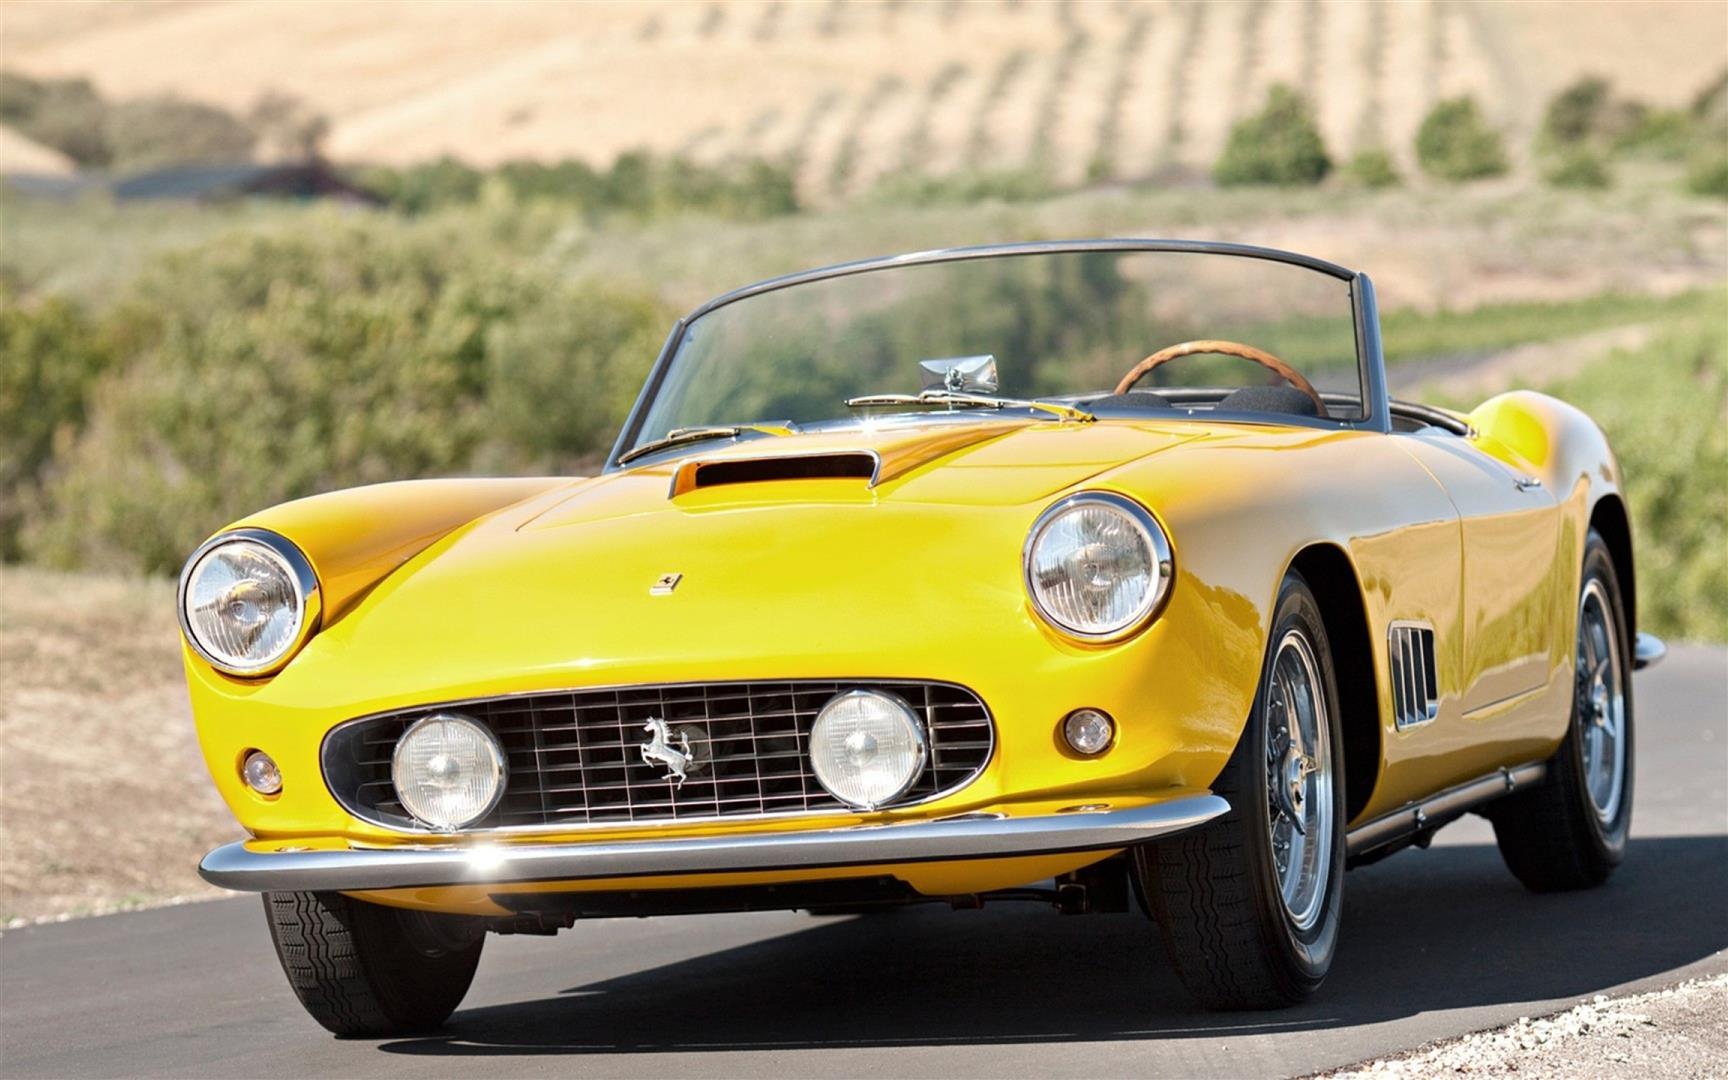 vintage_ferrari_convertible_yellow_95656_3840x2400 (Large).jpg